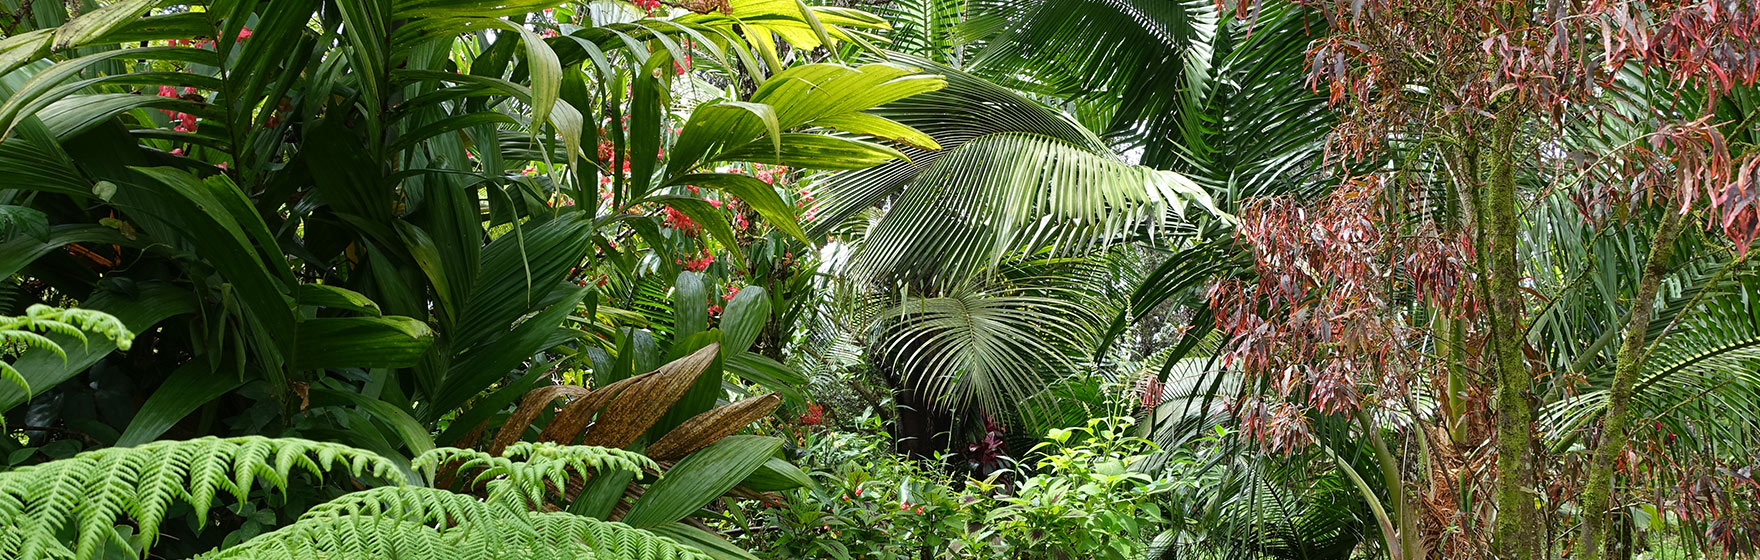 Kelley Orchidland Garden